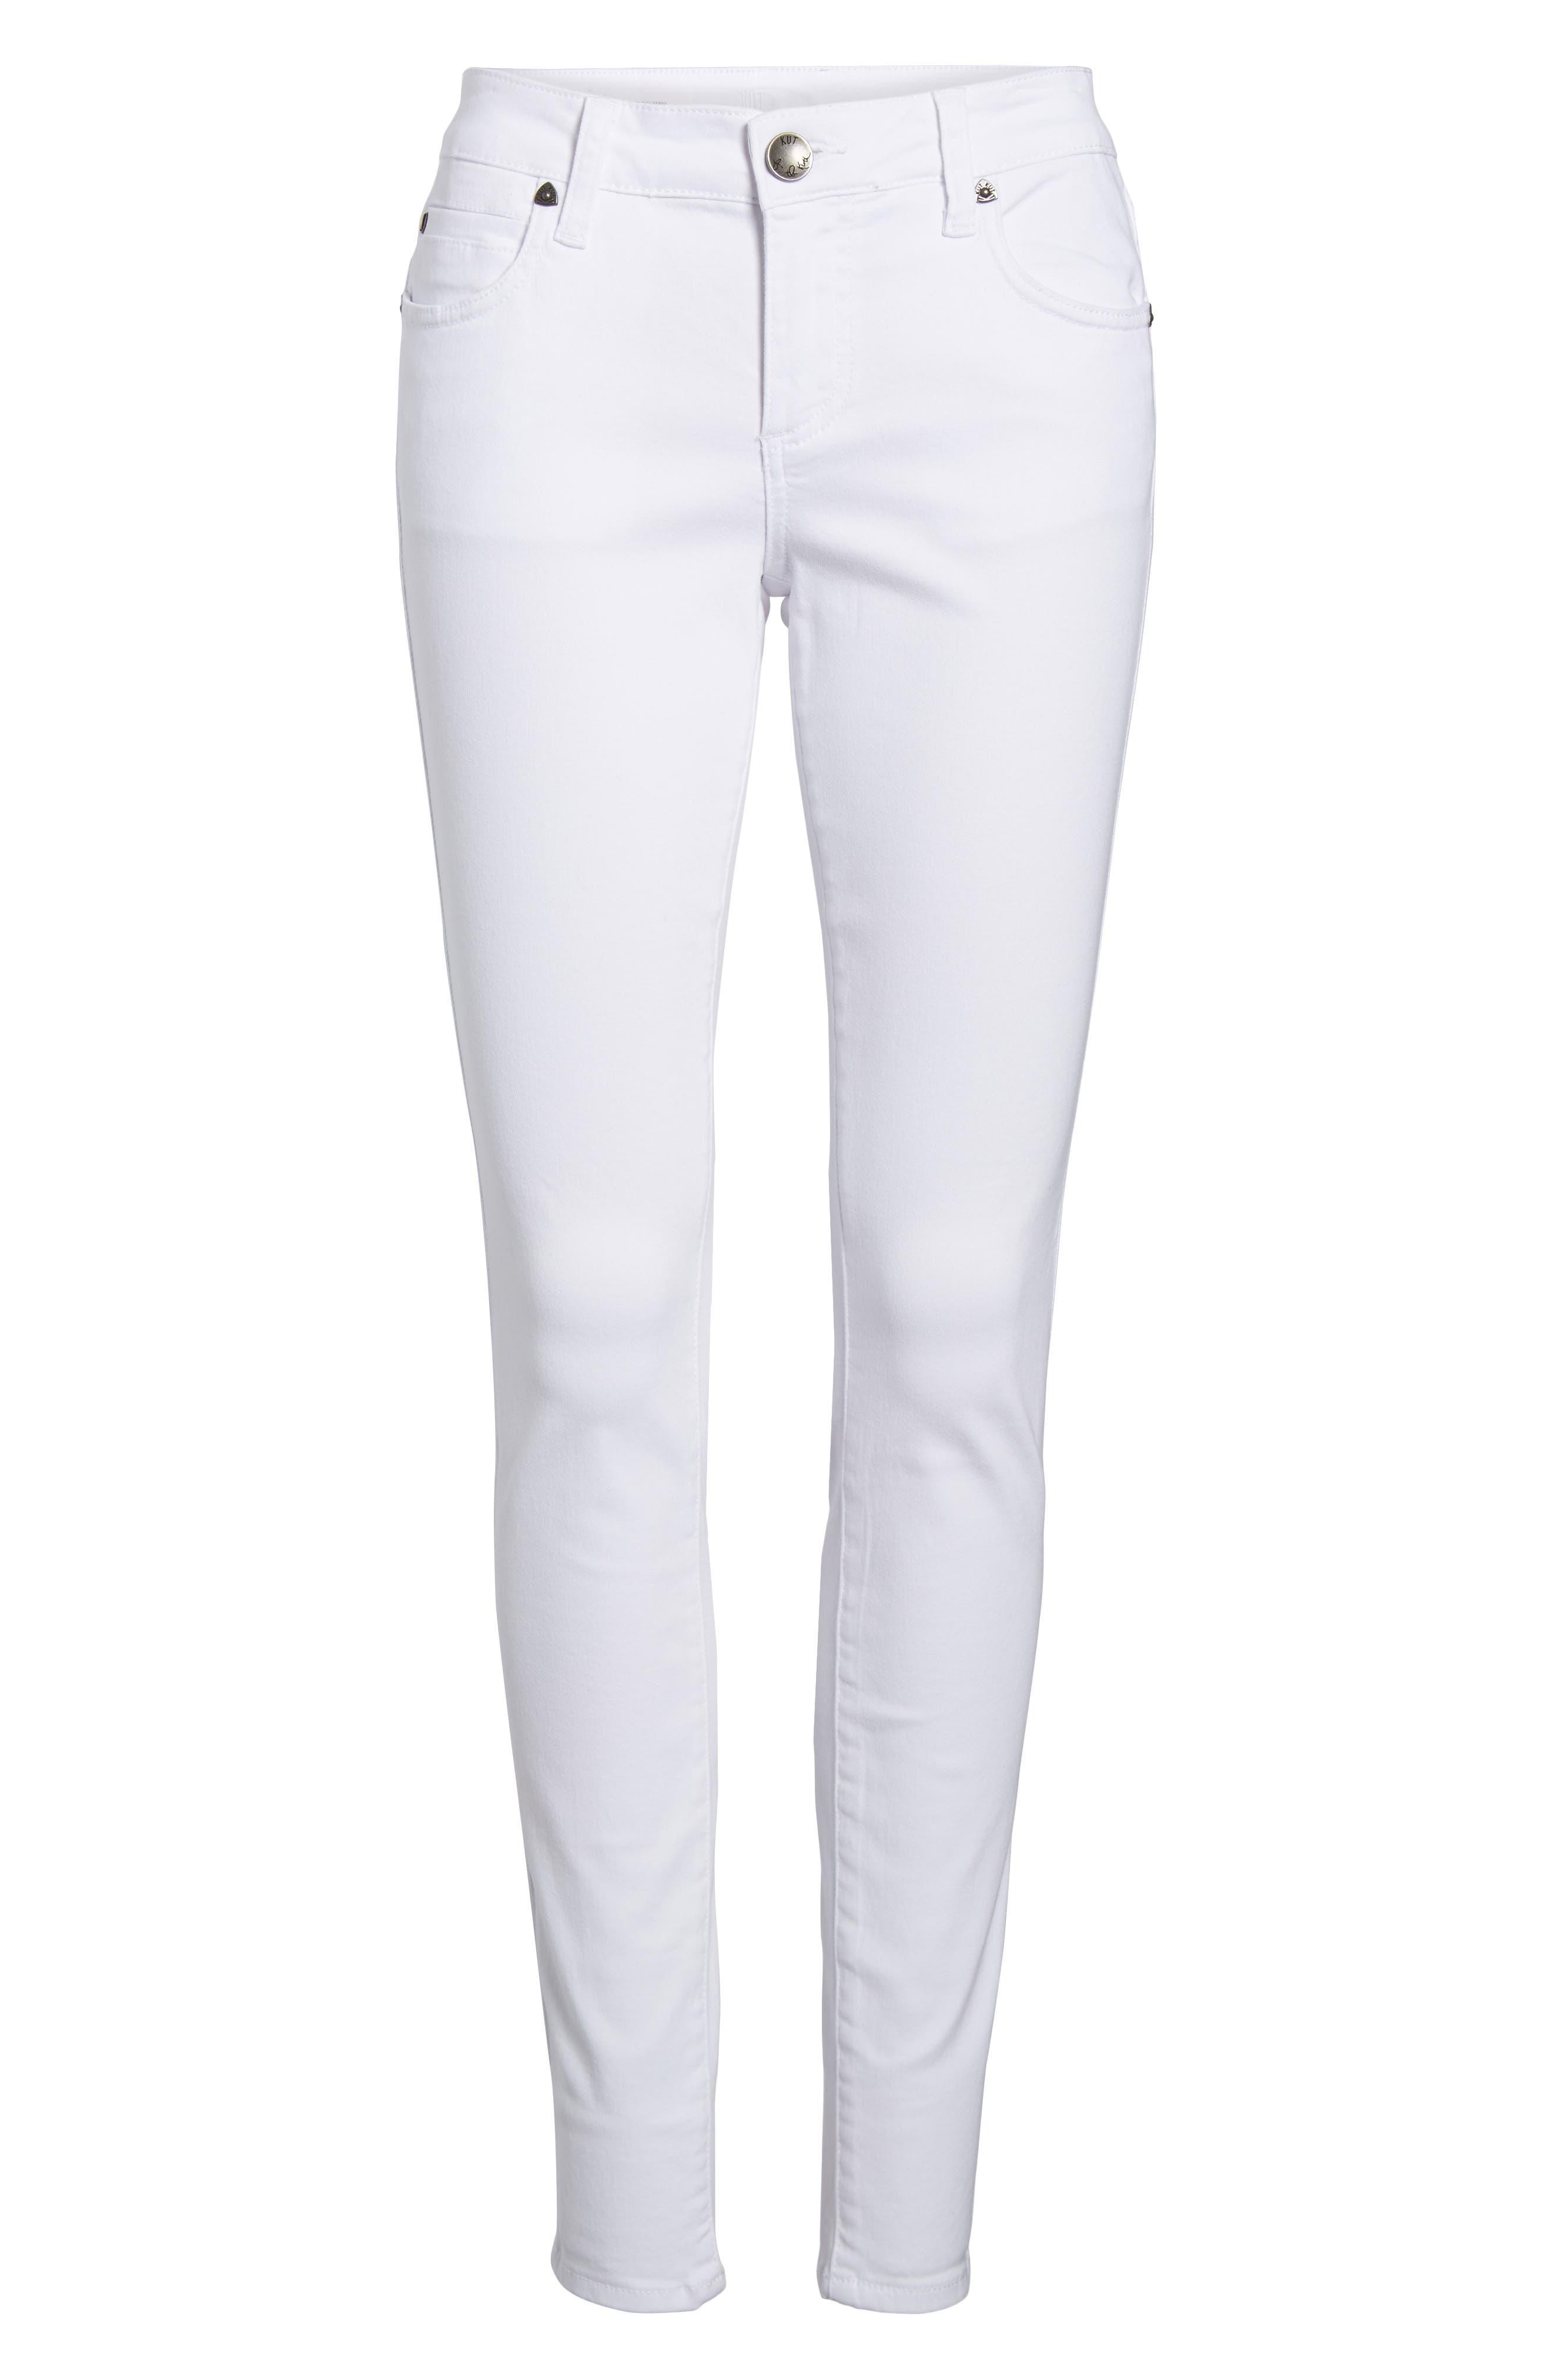 Mia Skinny Jeans,                             Alternate thumbnail 6, color,                             Optic White